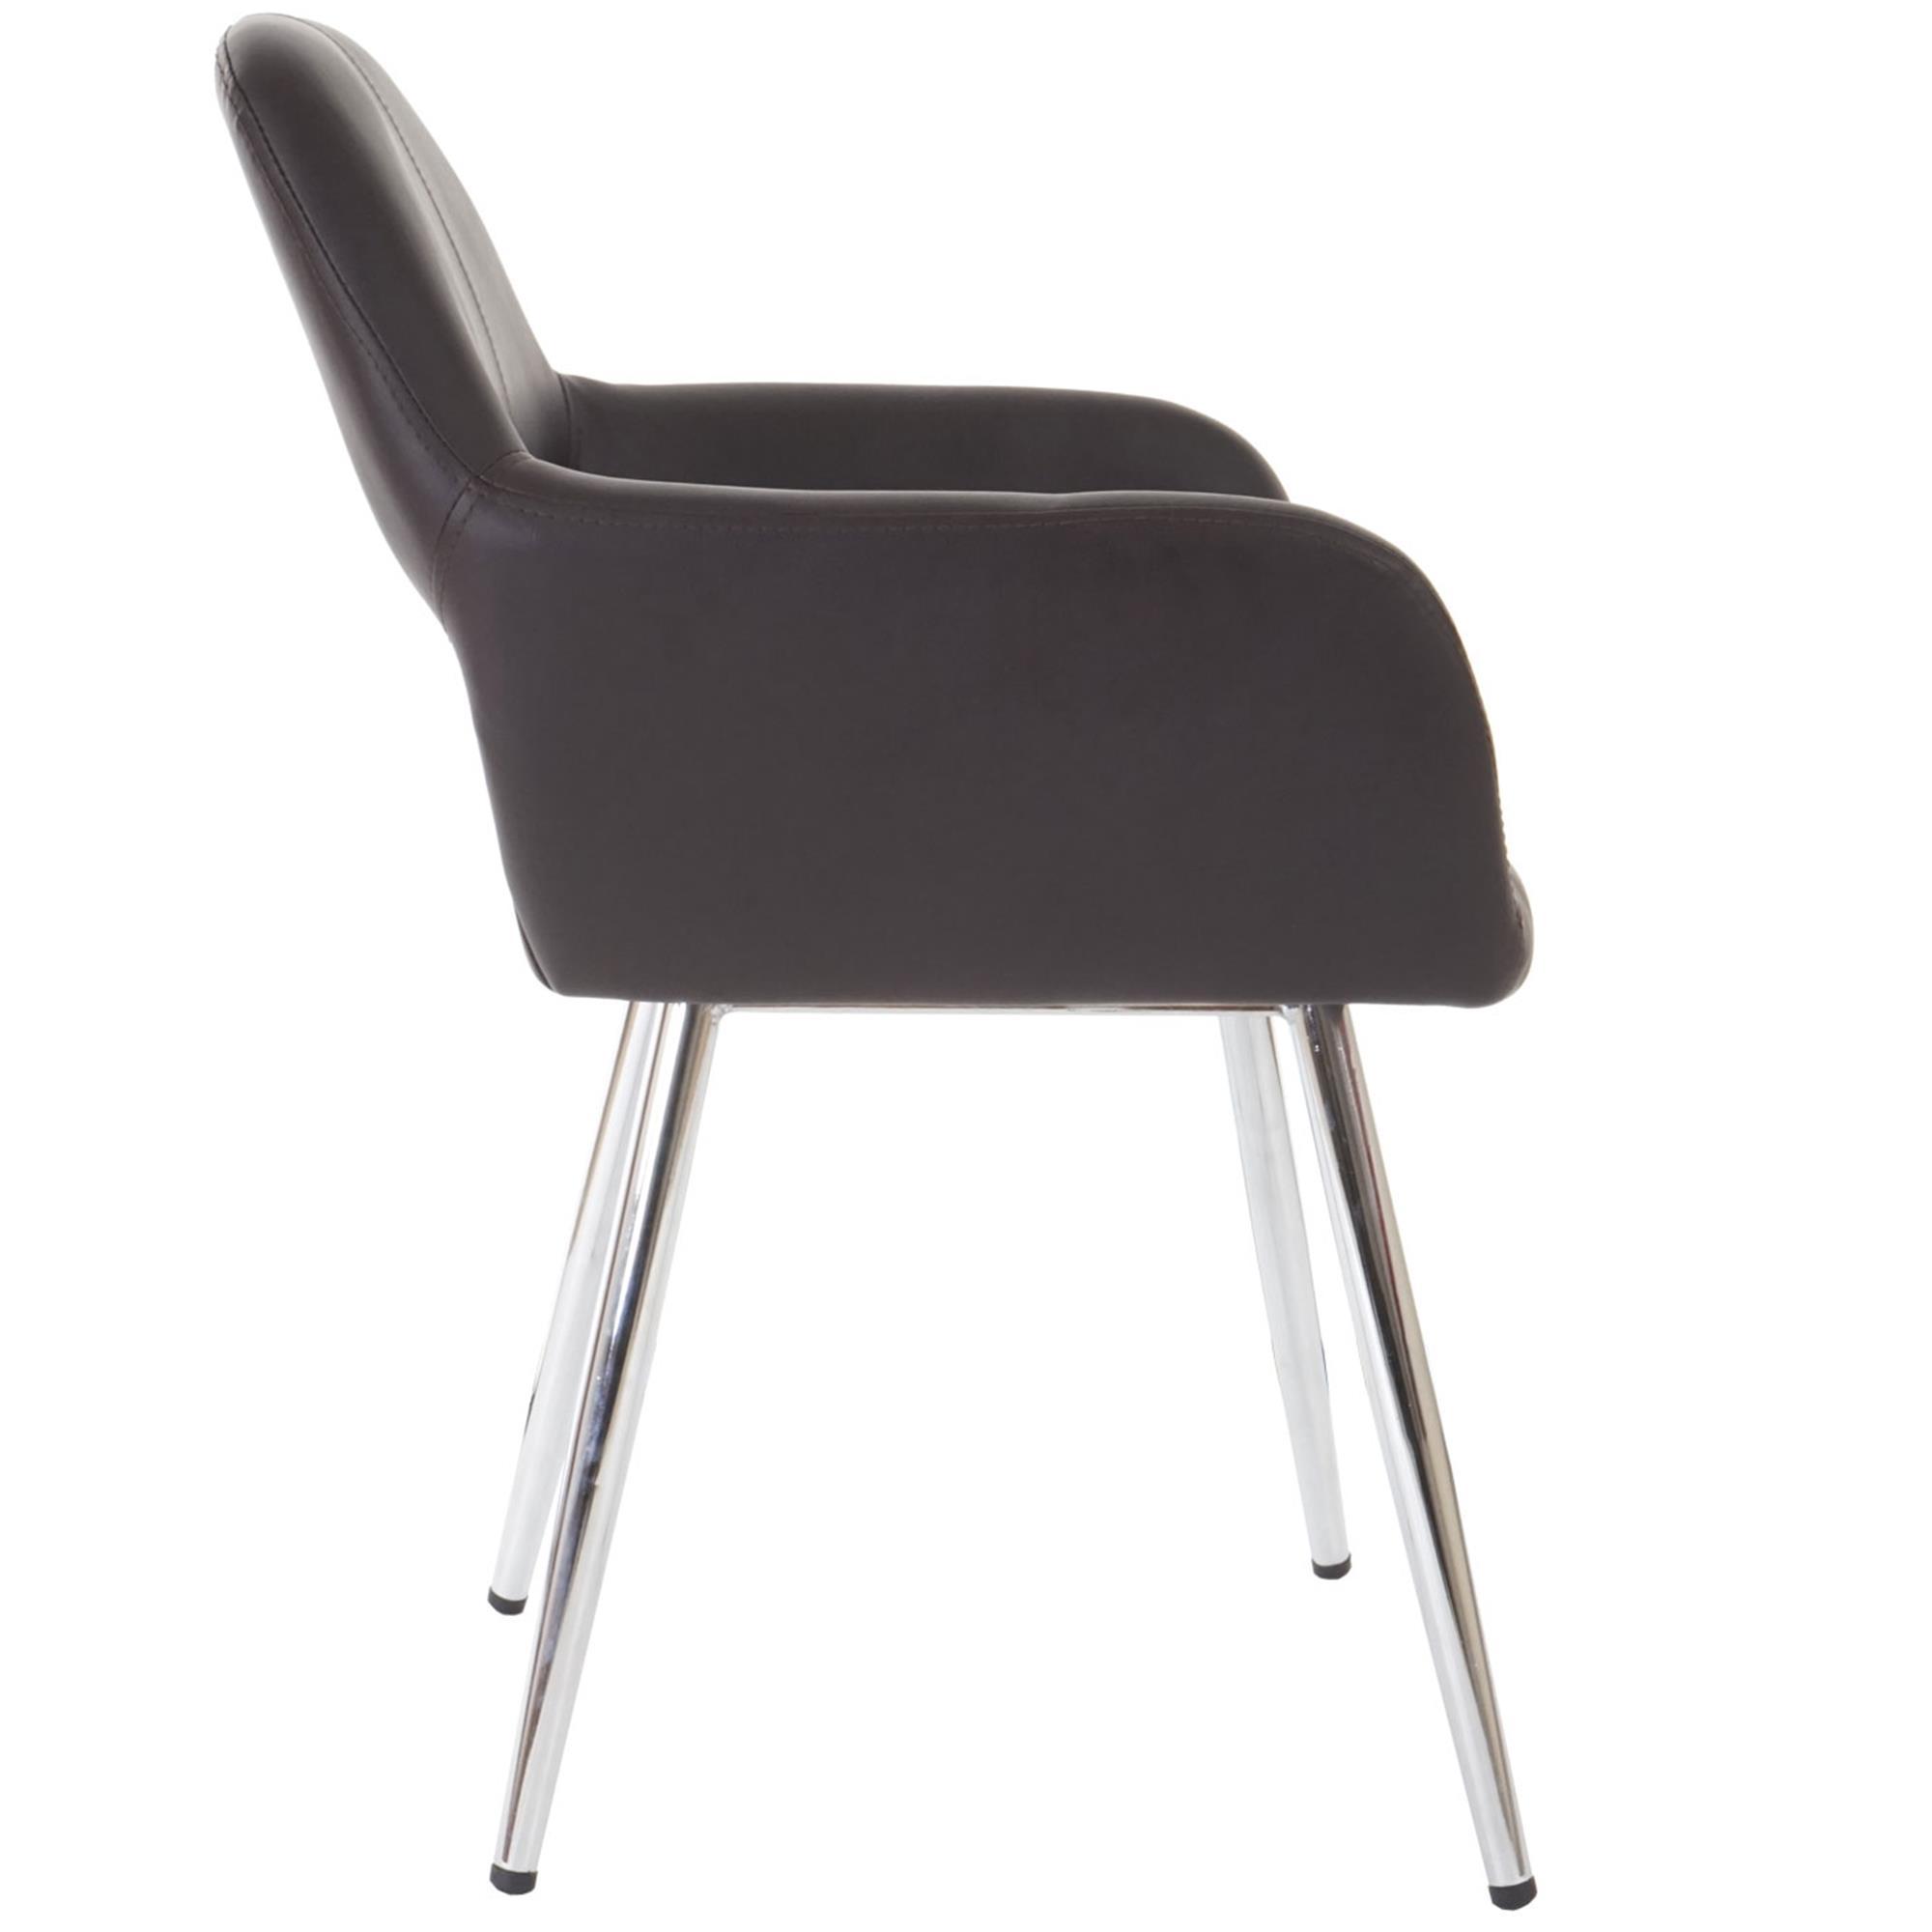 Lote 6 sillas de comedor o cocina calisa gran dise o con for Sillas comedor patas metalicas